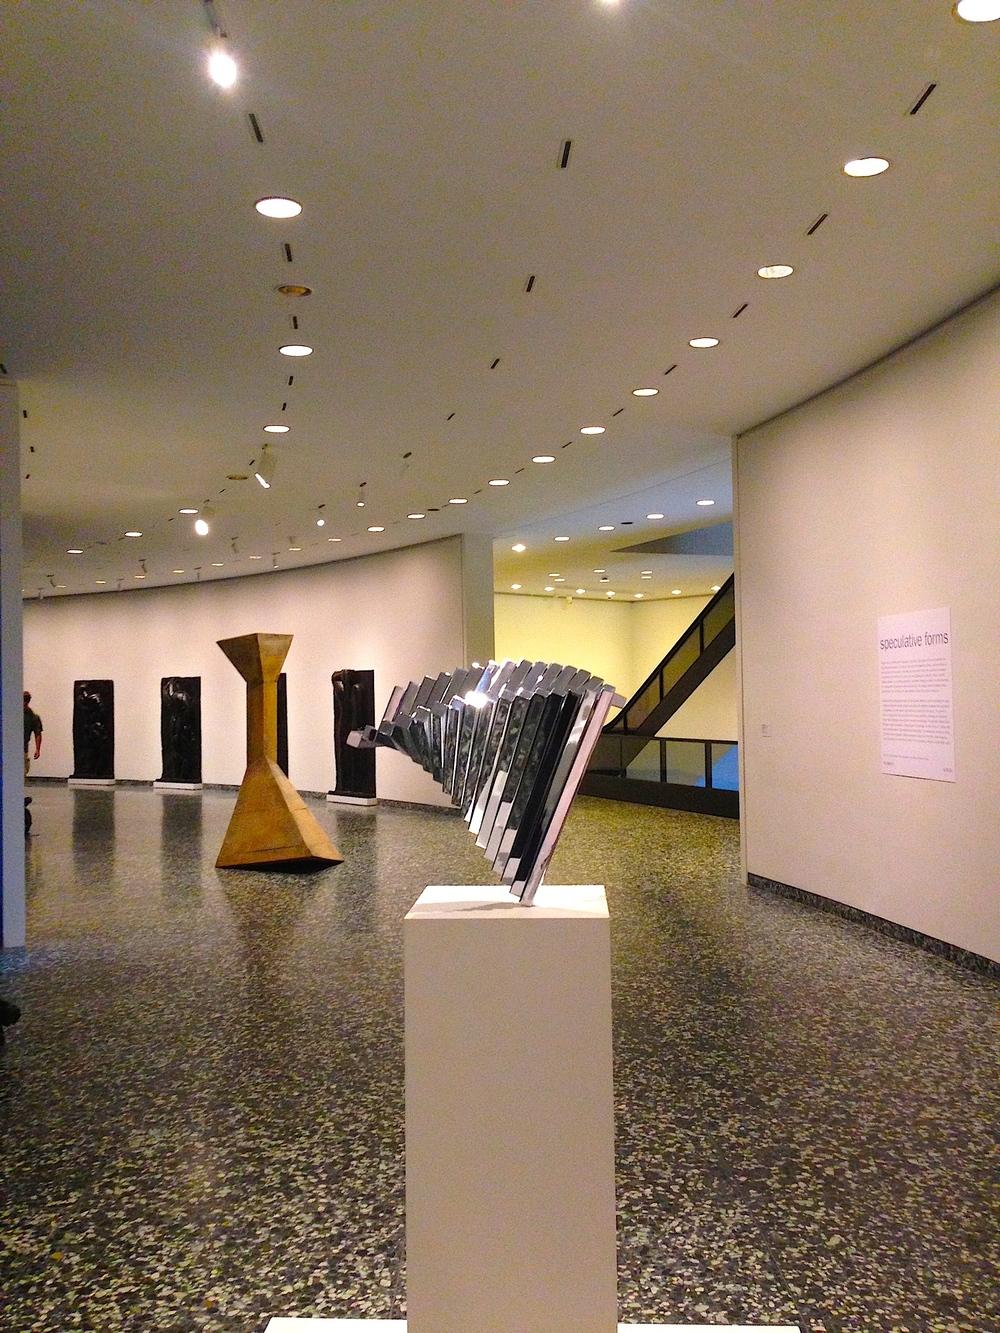 6-68_HirshhornMuseum.jpg